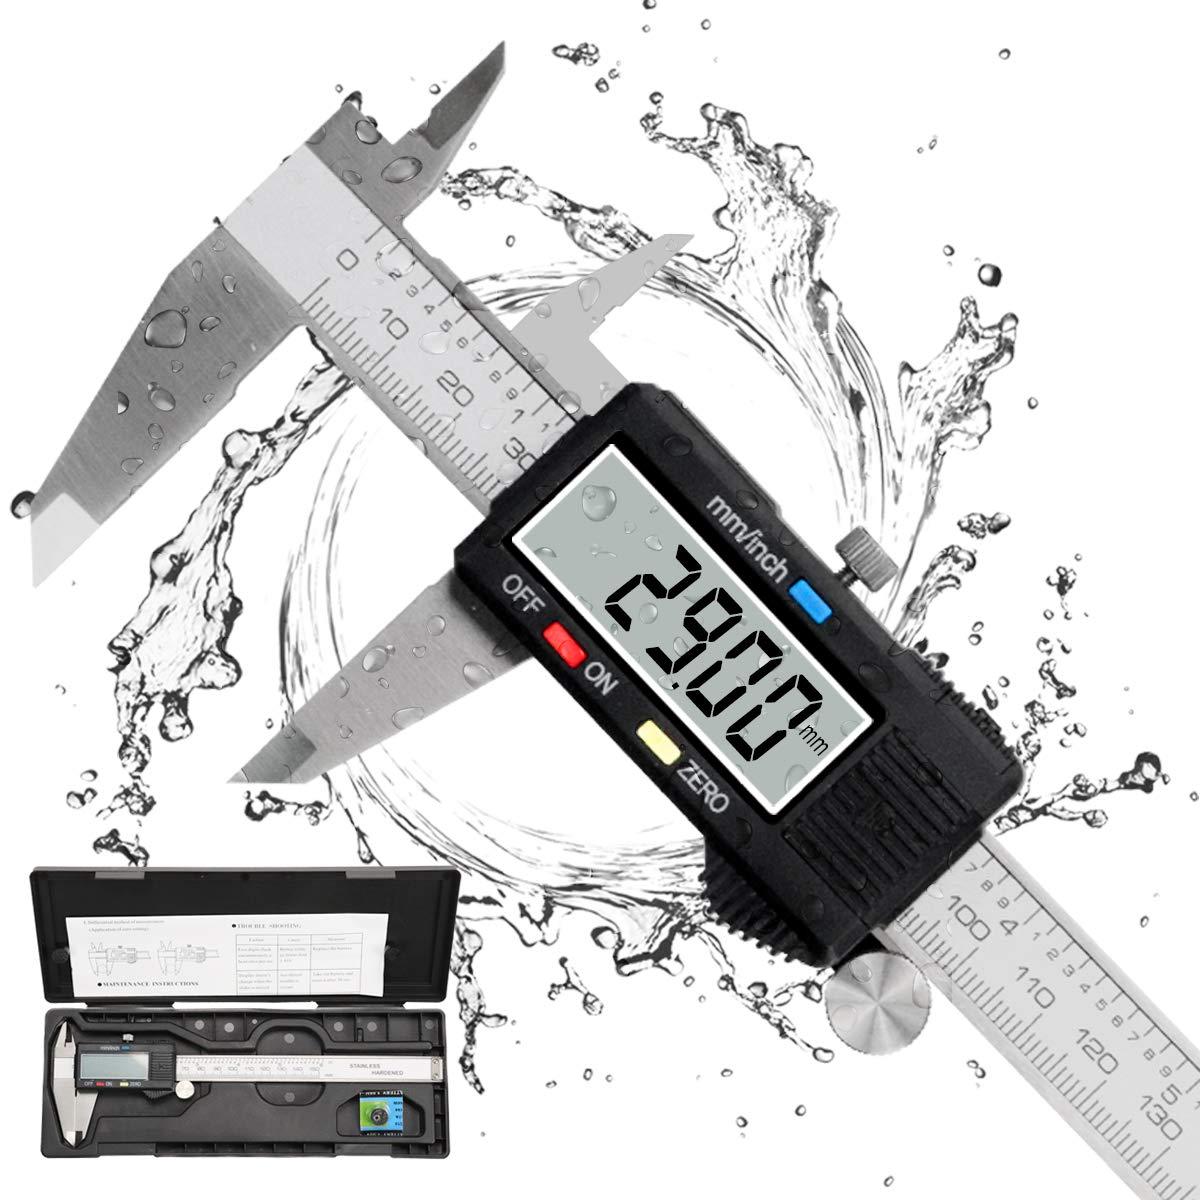 Calibre Digital, Qfun Pie de Rey Profesional Acero Inoxidable 150 mm con Pantalla LCD Grande Calibrador Digital Precisión 0.01mm Impermeable Medir Diámetro Interior Exterior Profundidad